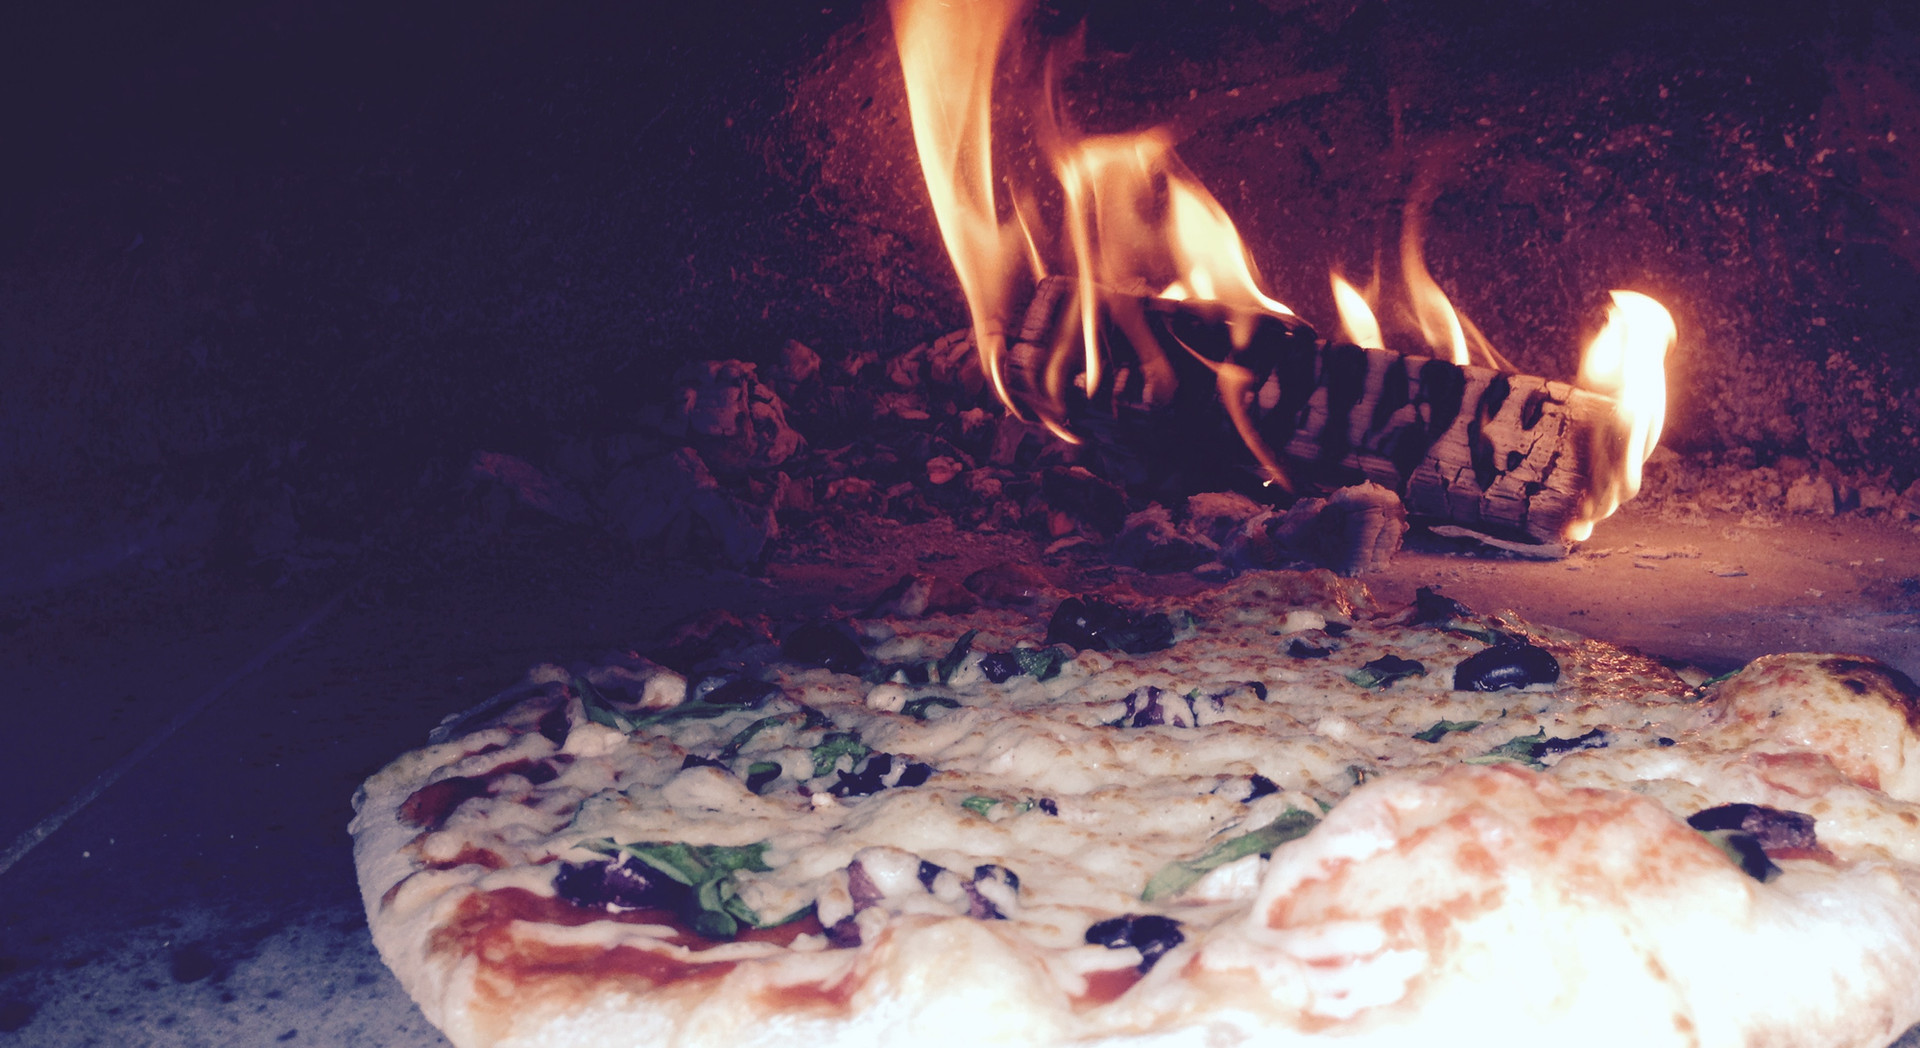 Wodd fired pizza